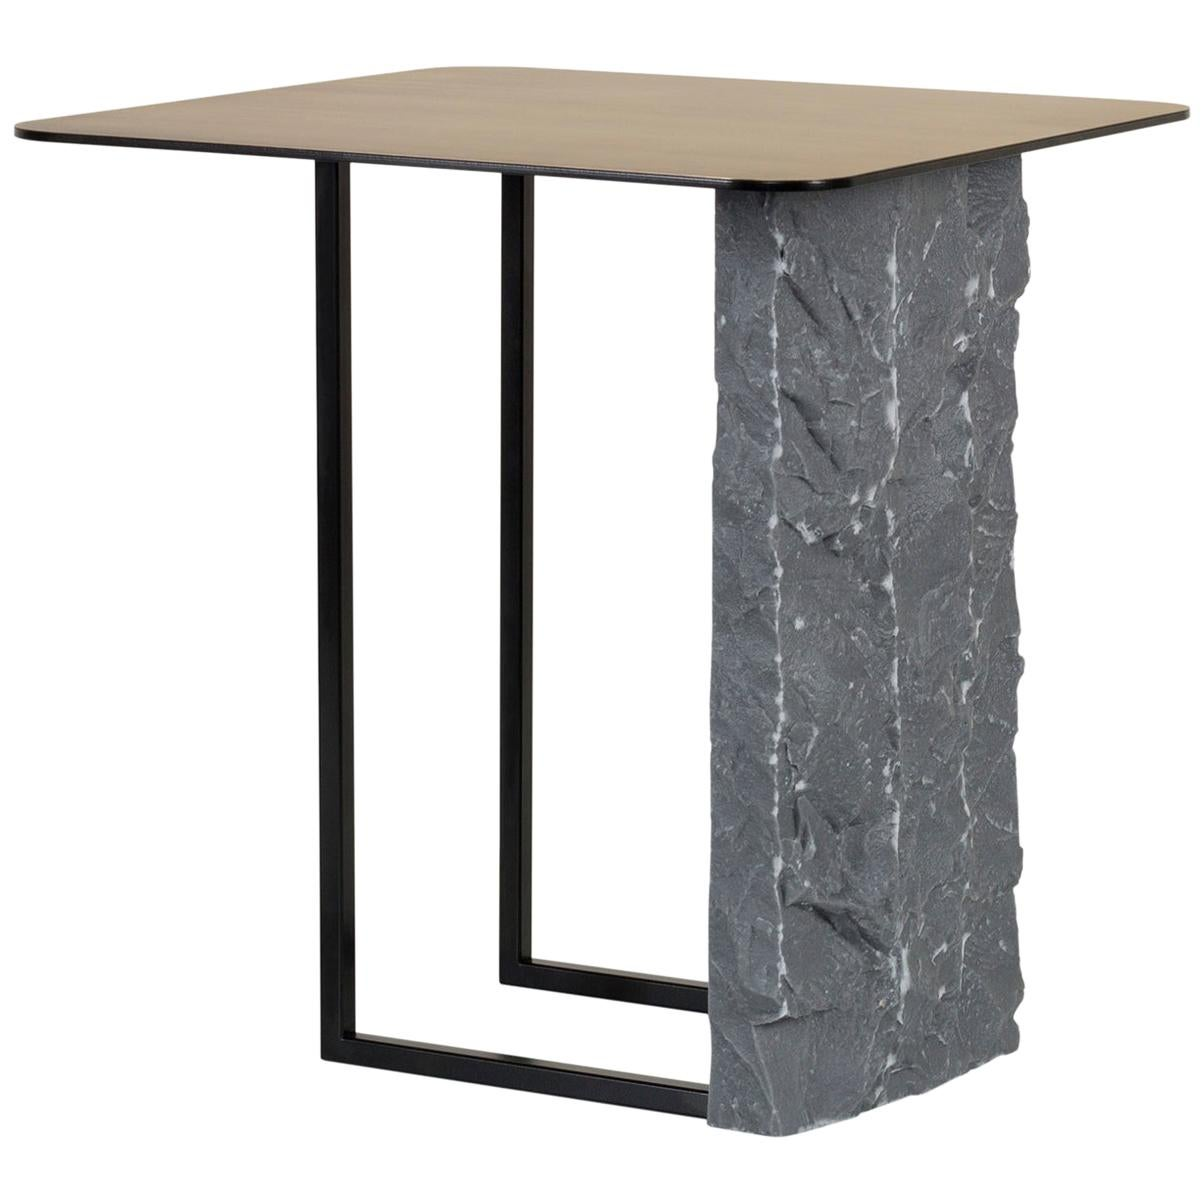 Aire Side Table XL Bardiglio Marble Matt Finish Oxidized Brass Black Lacquered